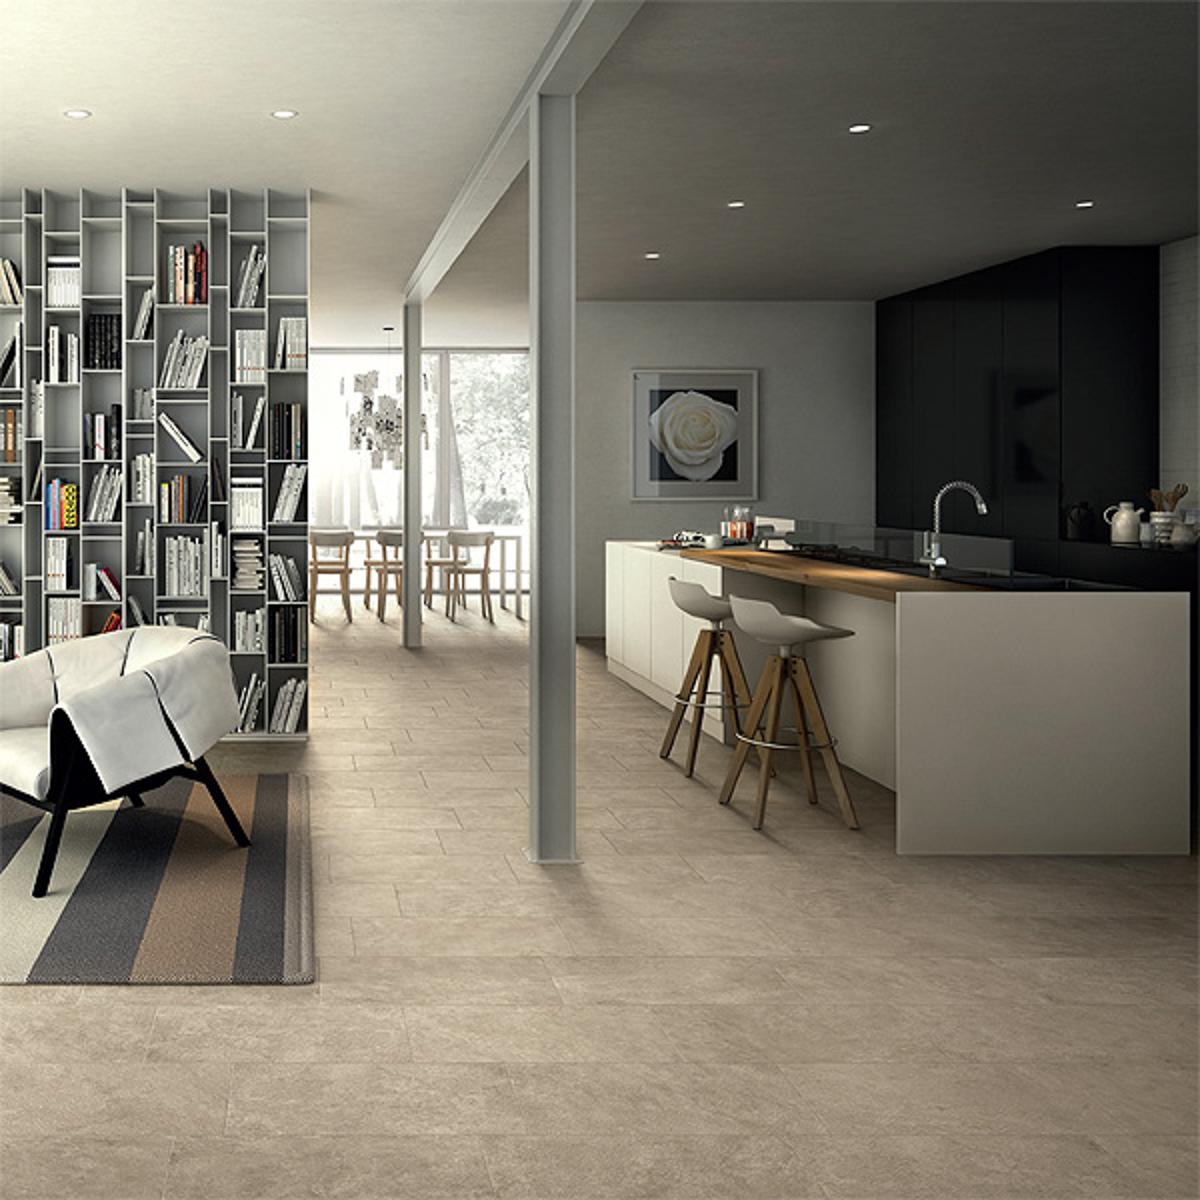 Modular tiles superb quality range elstow ceramics modular floor 2 dailygadgetfo Image collections